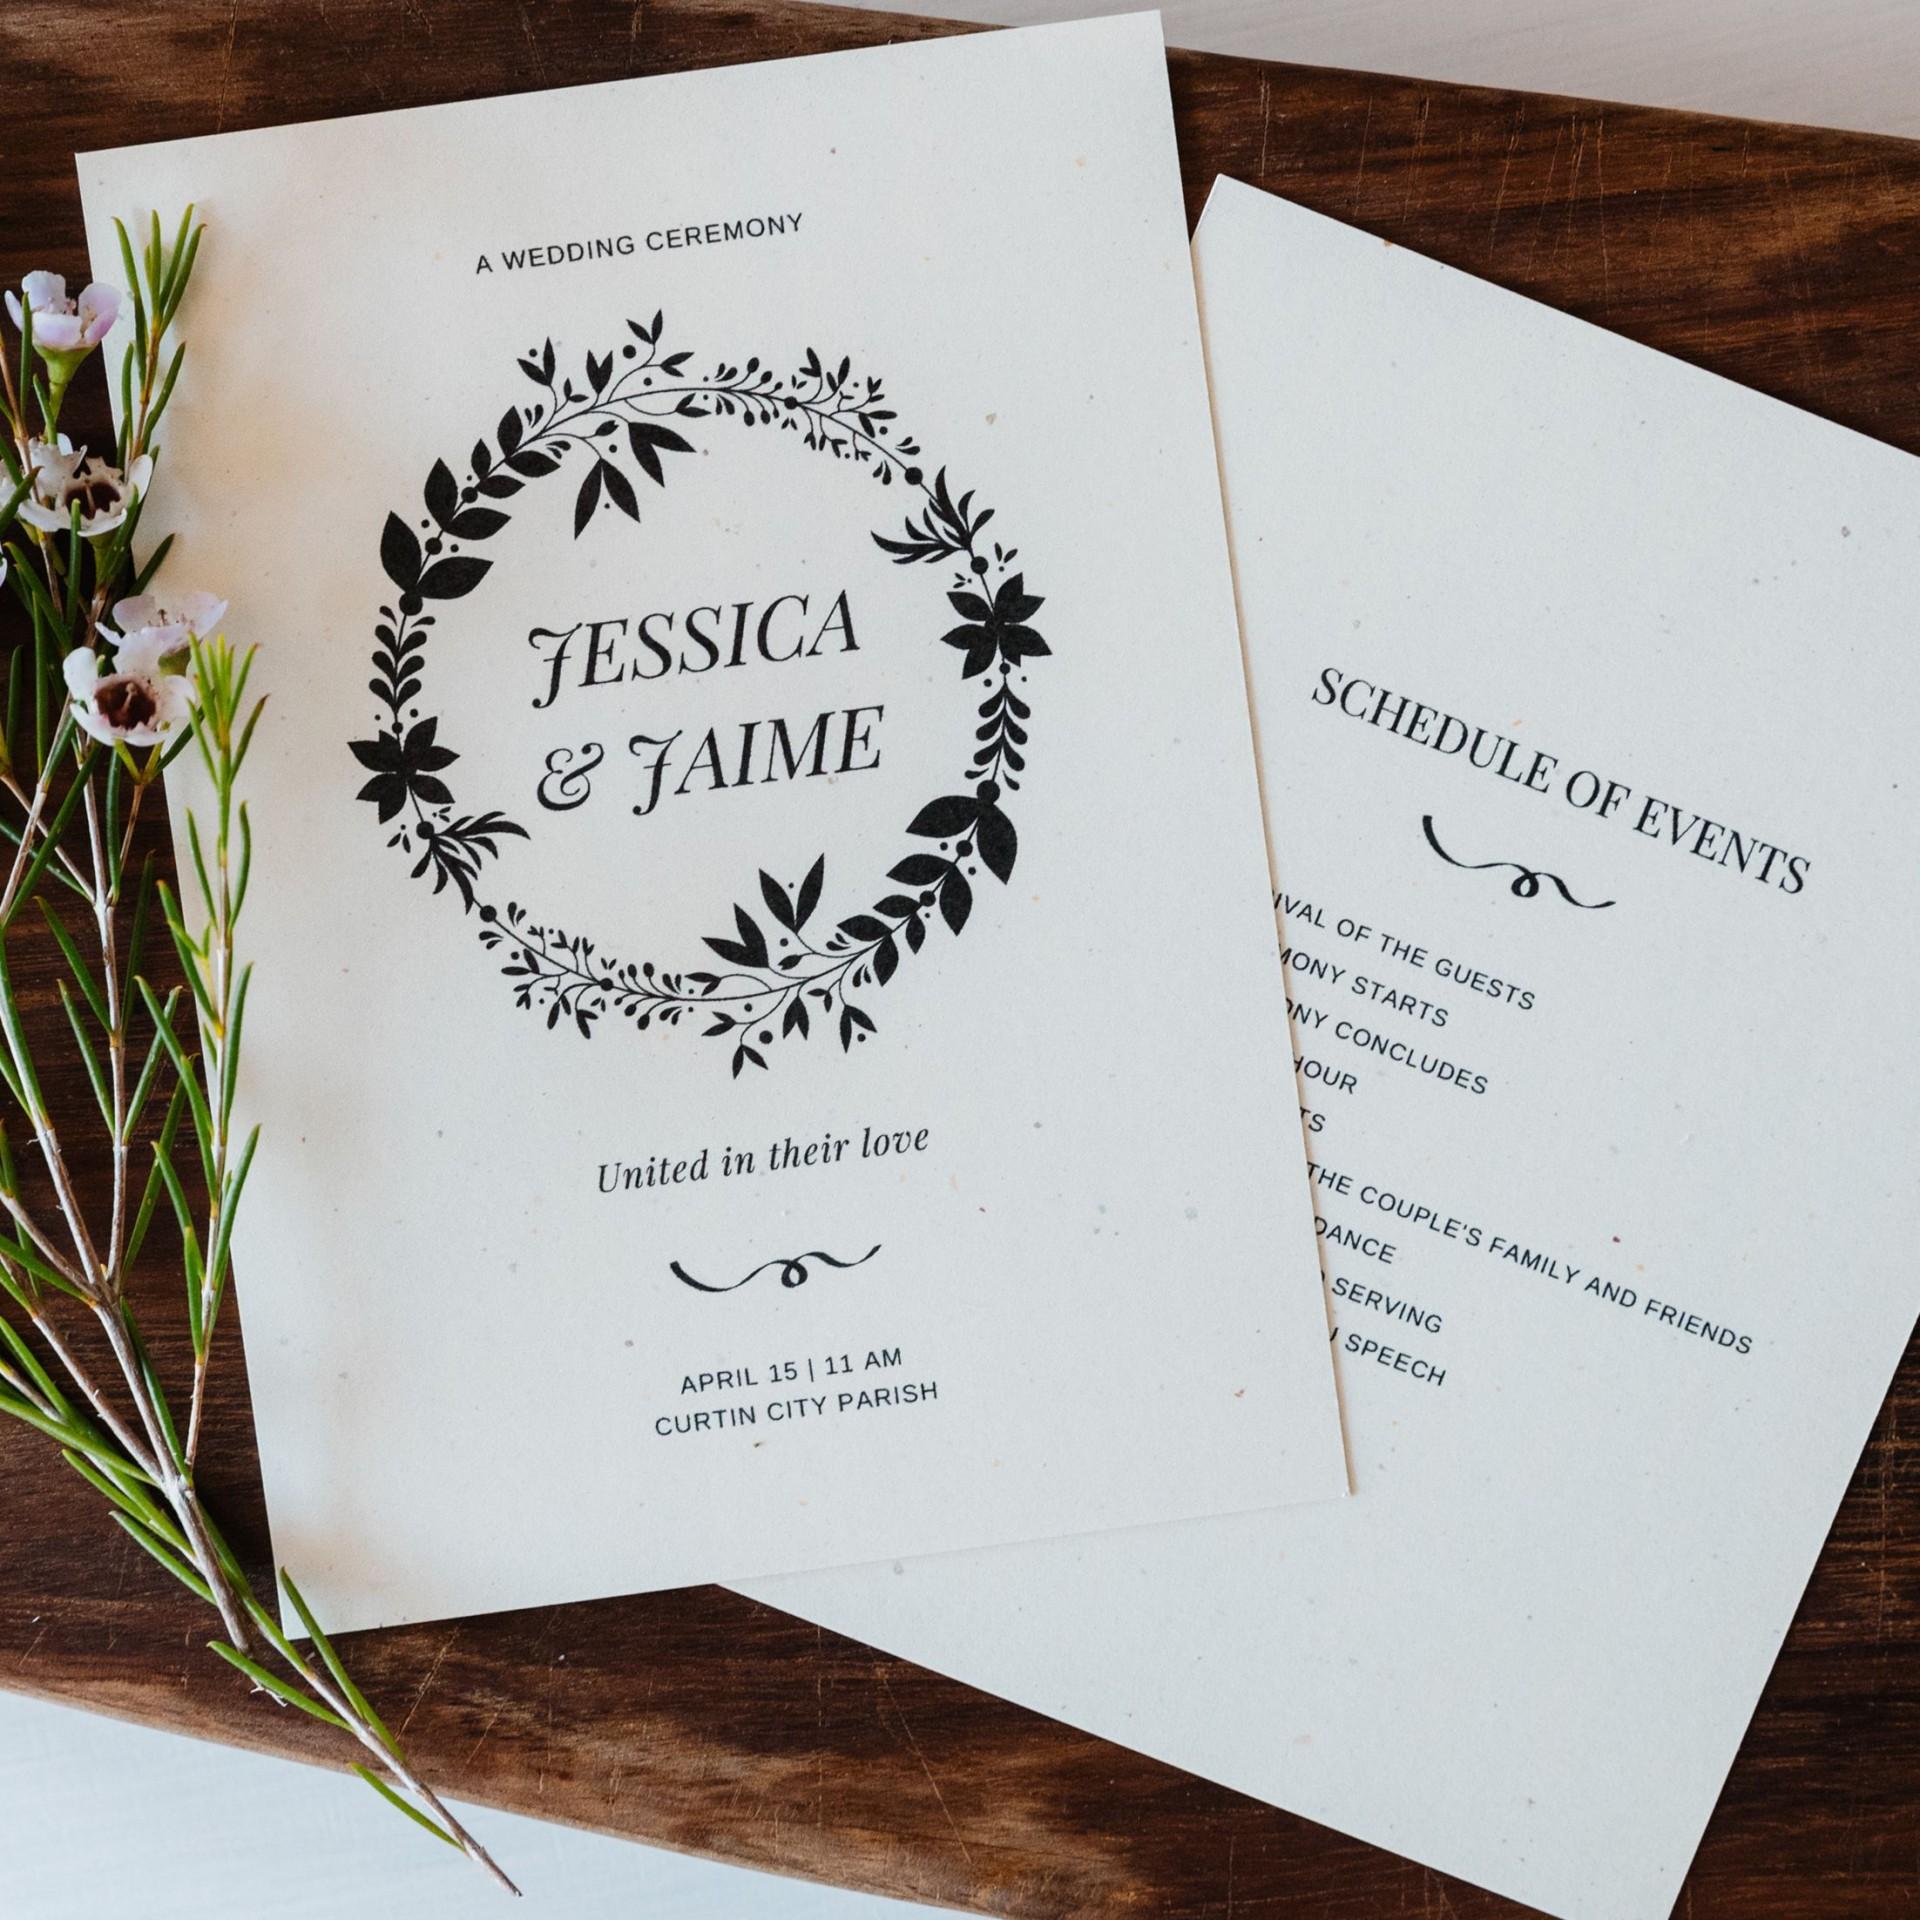 006 Marvelou Free Printable Wedding Program Paddle Fan Template Concept  Templates1920